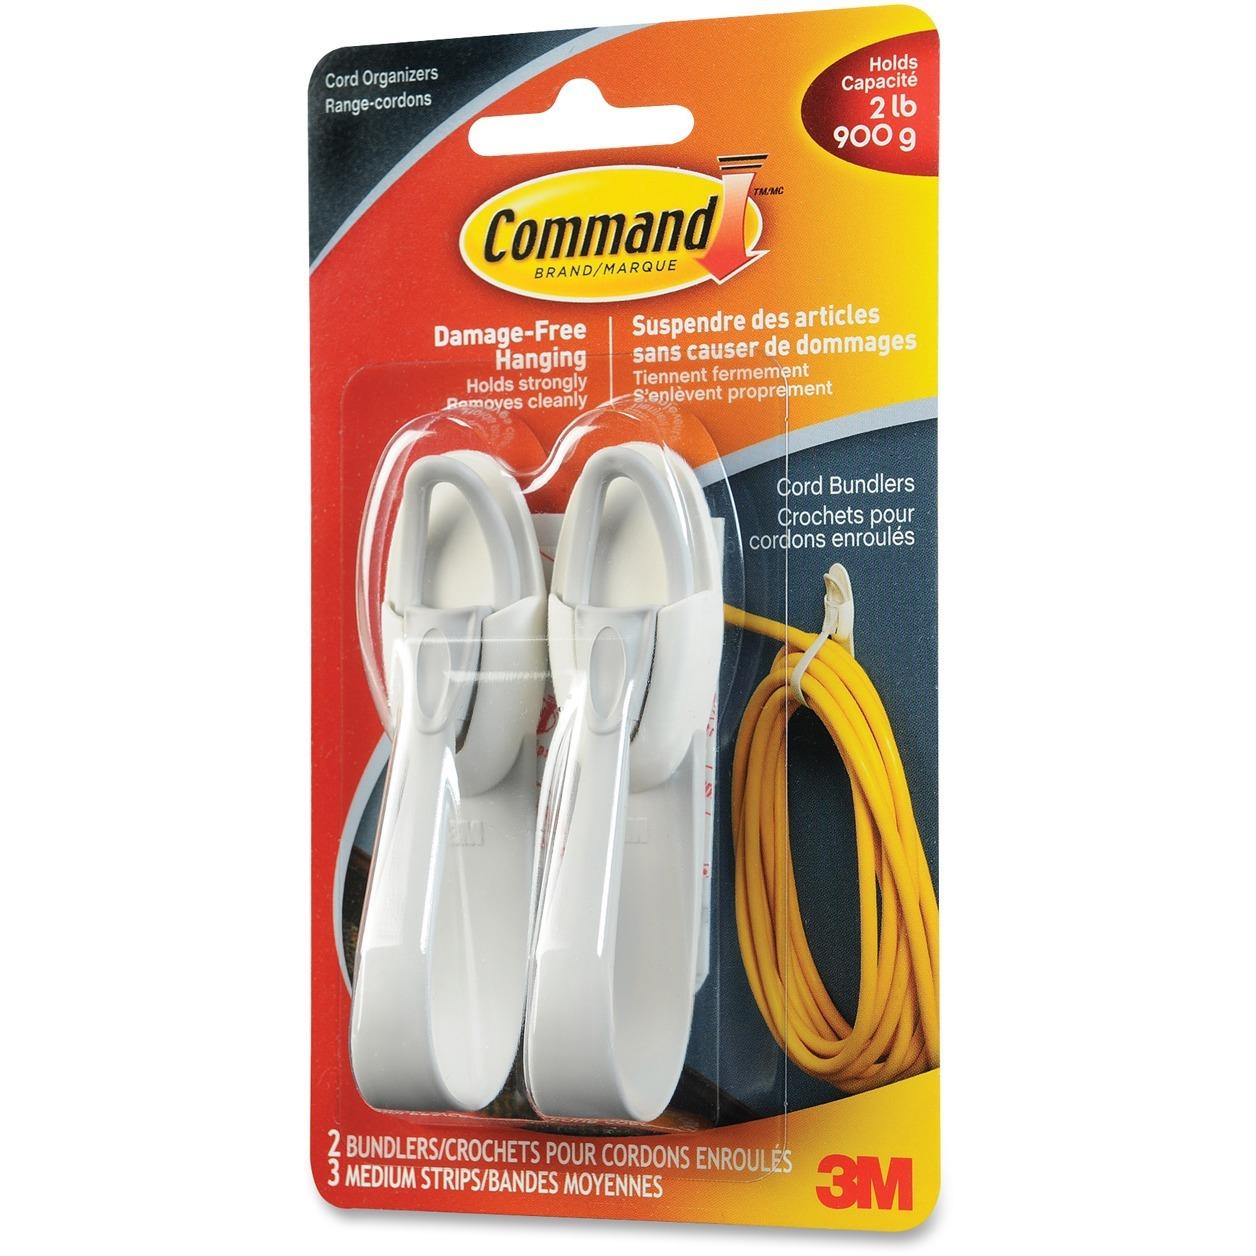 Cord Organizer 4 Packs Command  Cord Bundlers 2-Bundlers